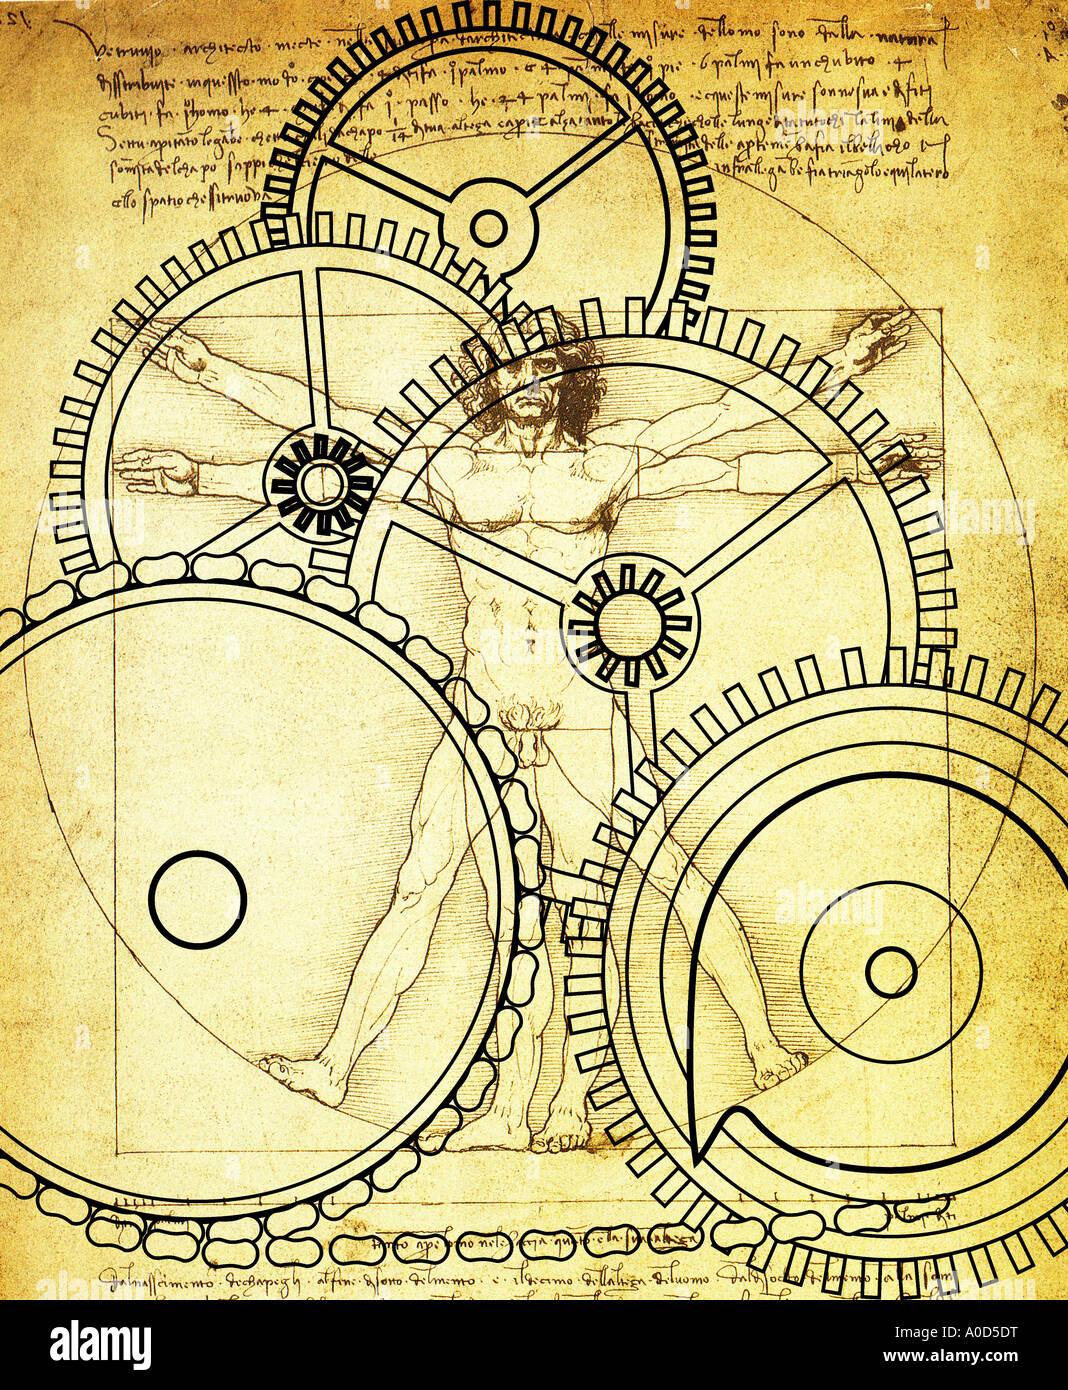 Vitruvian Man Leonardo Da Vinci Stock Photos & Vitruvian Man ...